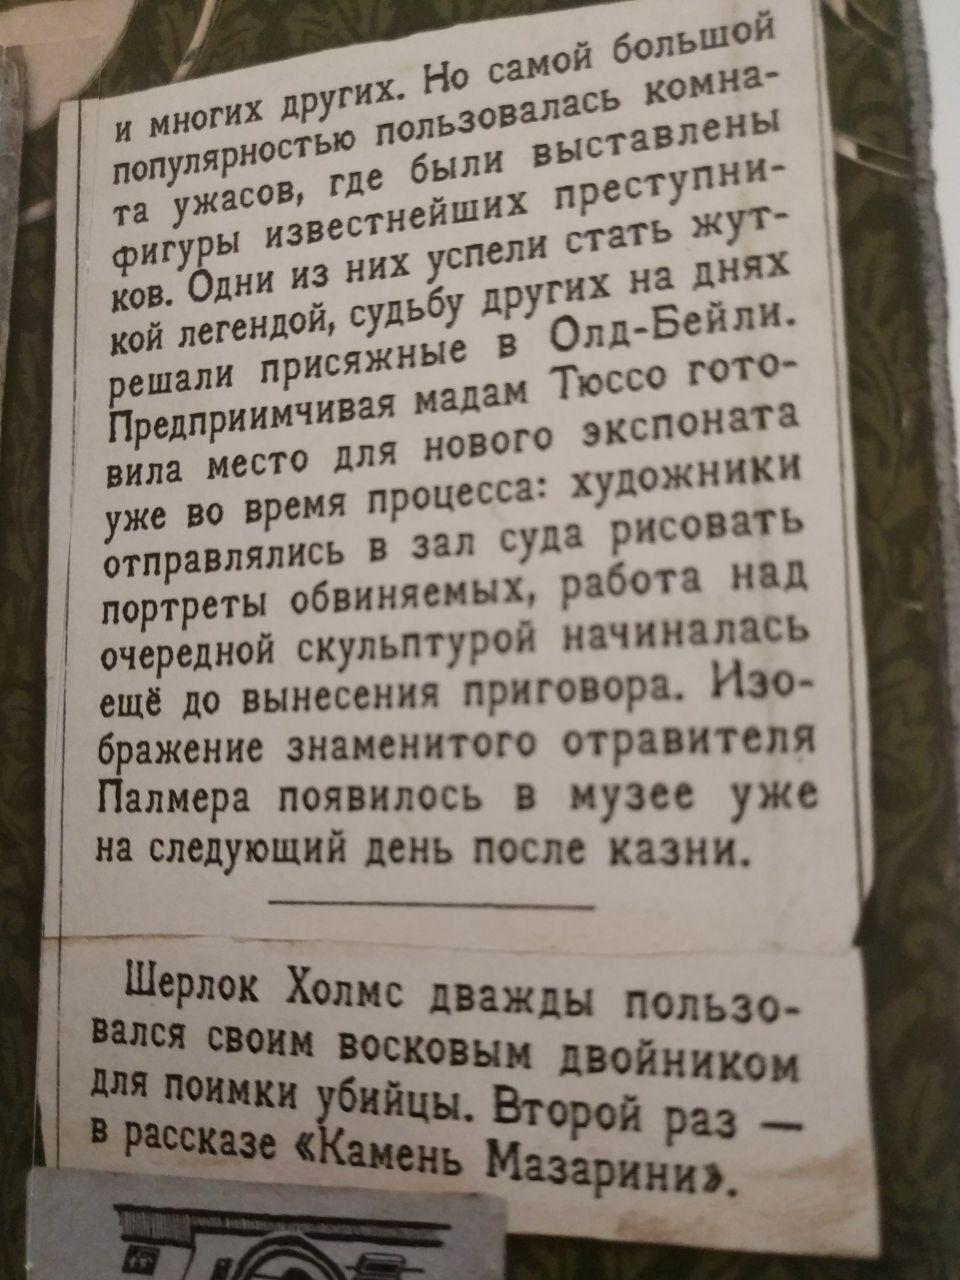 http://s7.uploads.ru/iM1J8.jpg